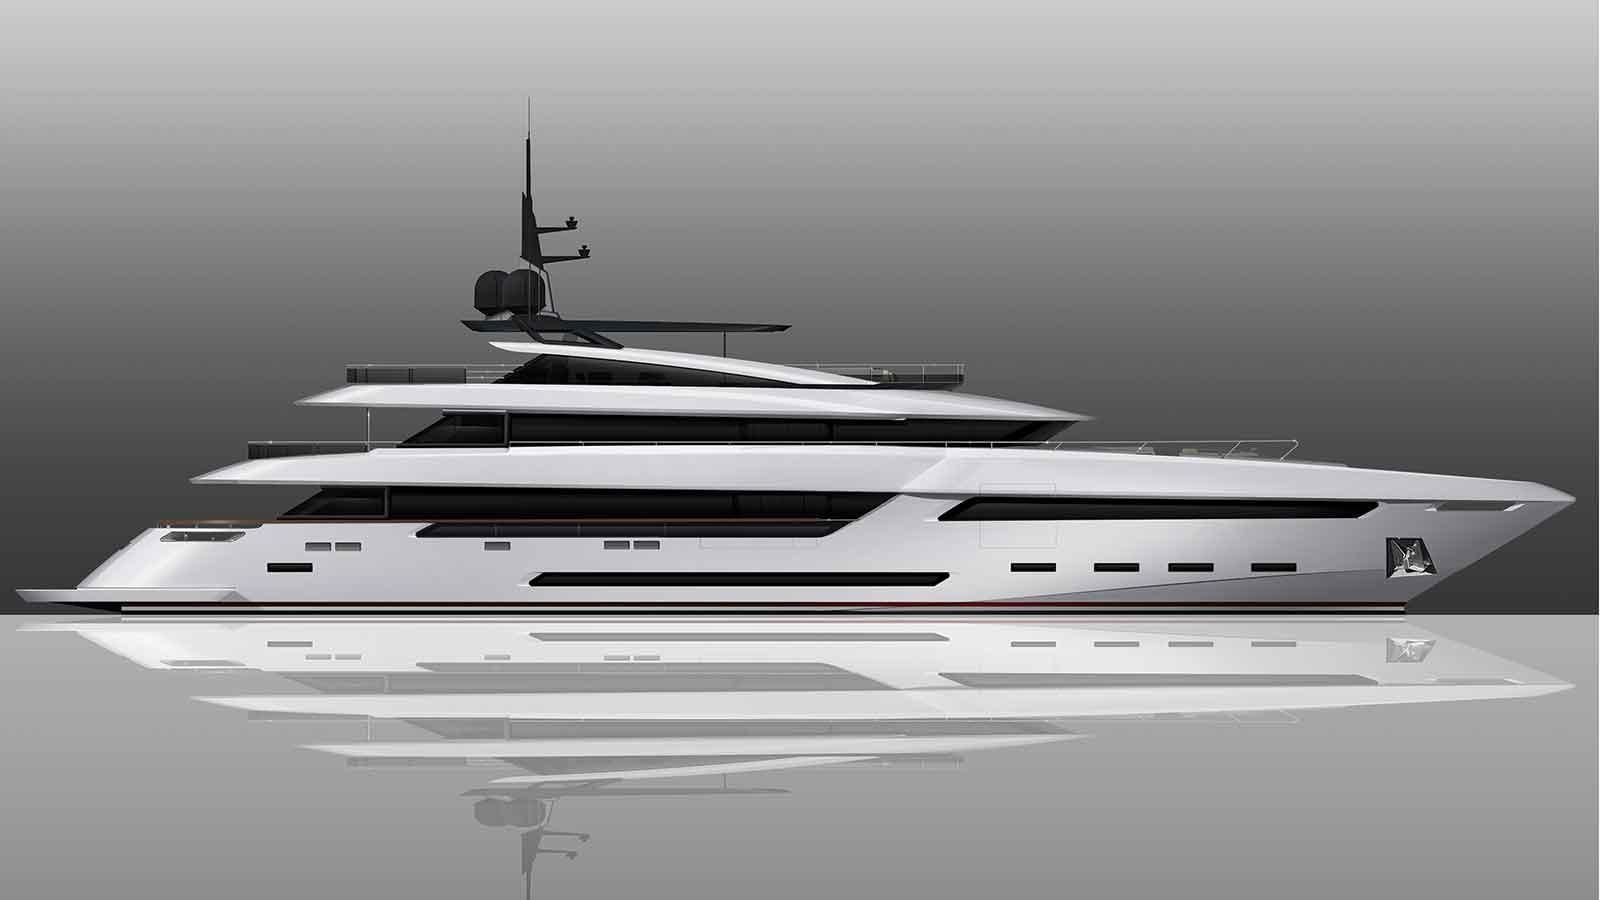 Gyachts-2017-PRINCE SHARK-1-03082017